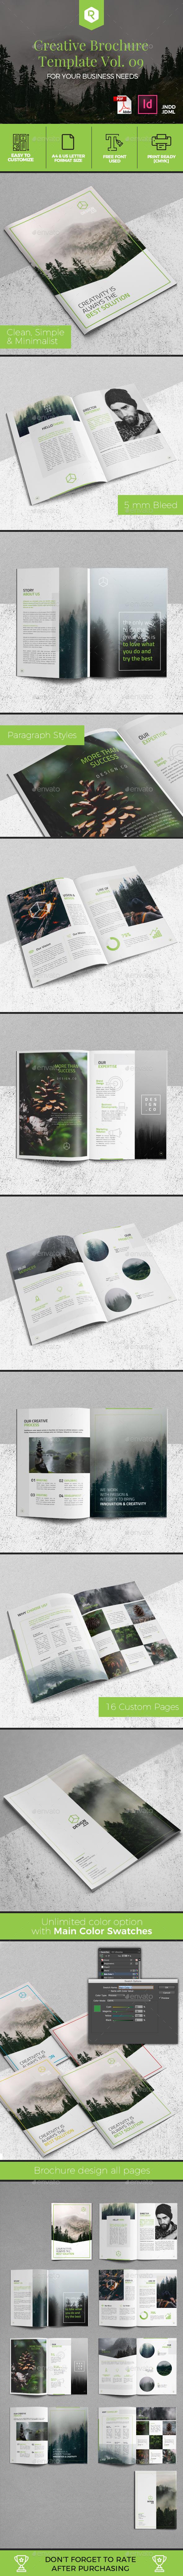 Creative Brochure Template Vol. 09 - Corporate Brochures